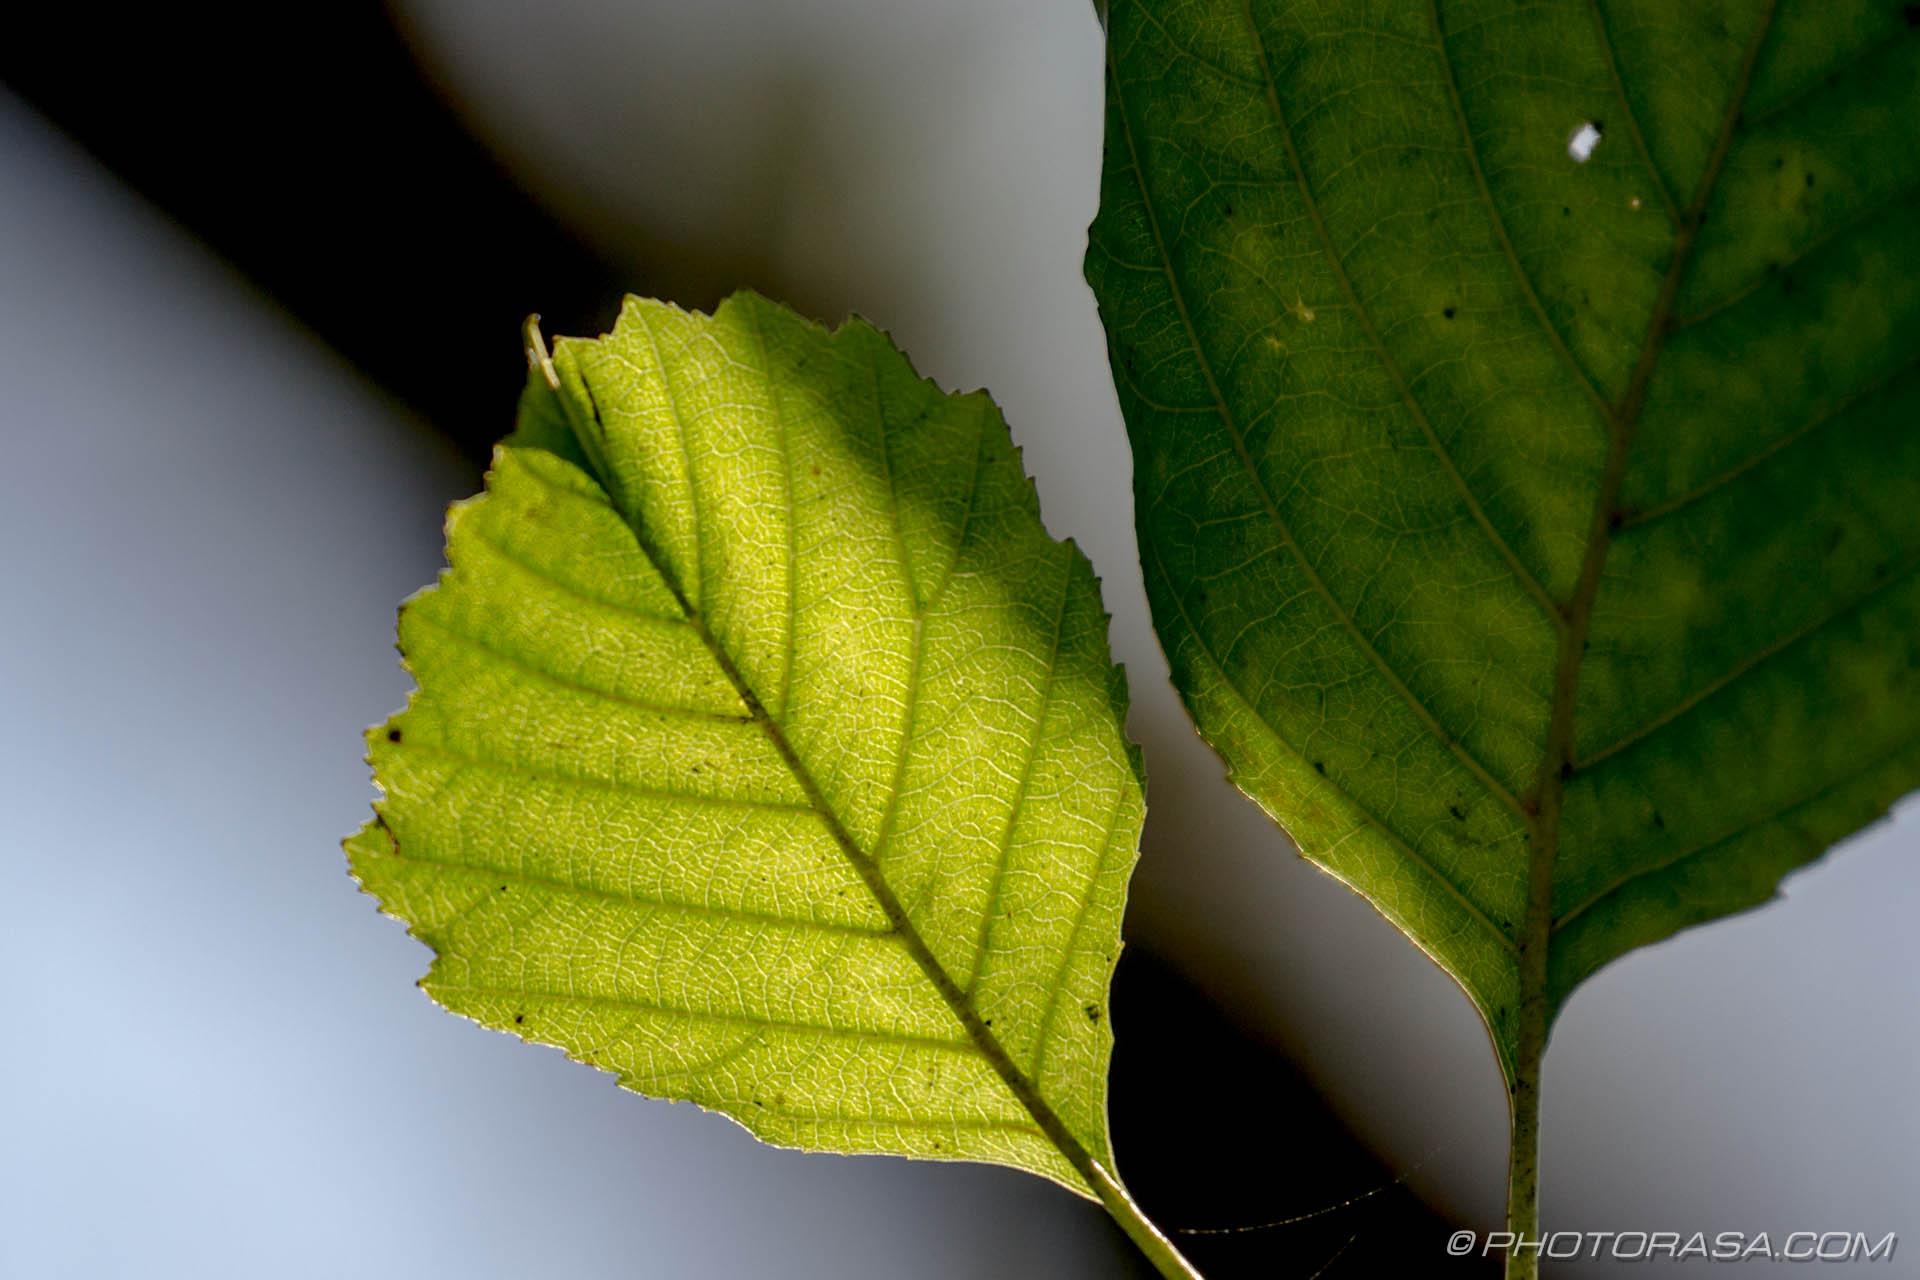 http://photorasa.com/autumn-leaves-sunlight/hazel-leaf-in-autumn-sunlight/